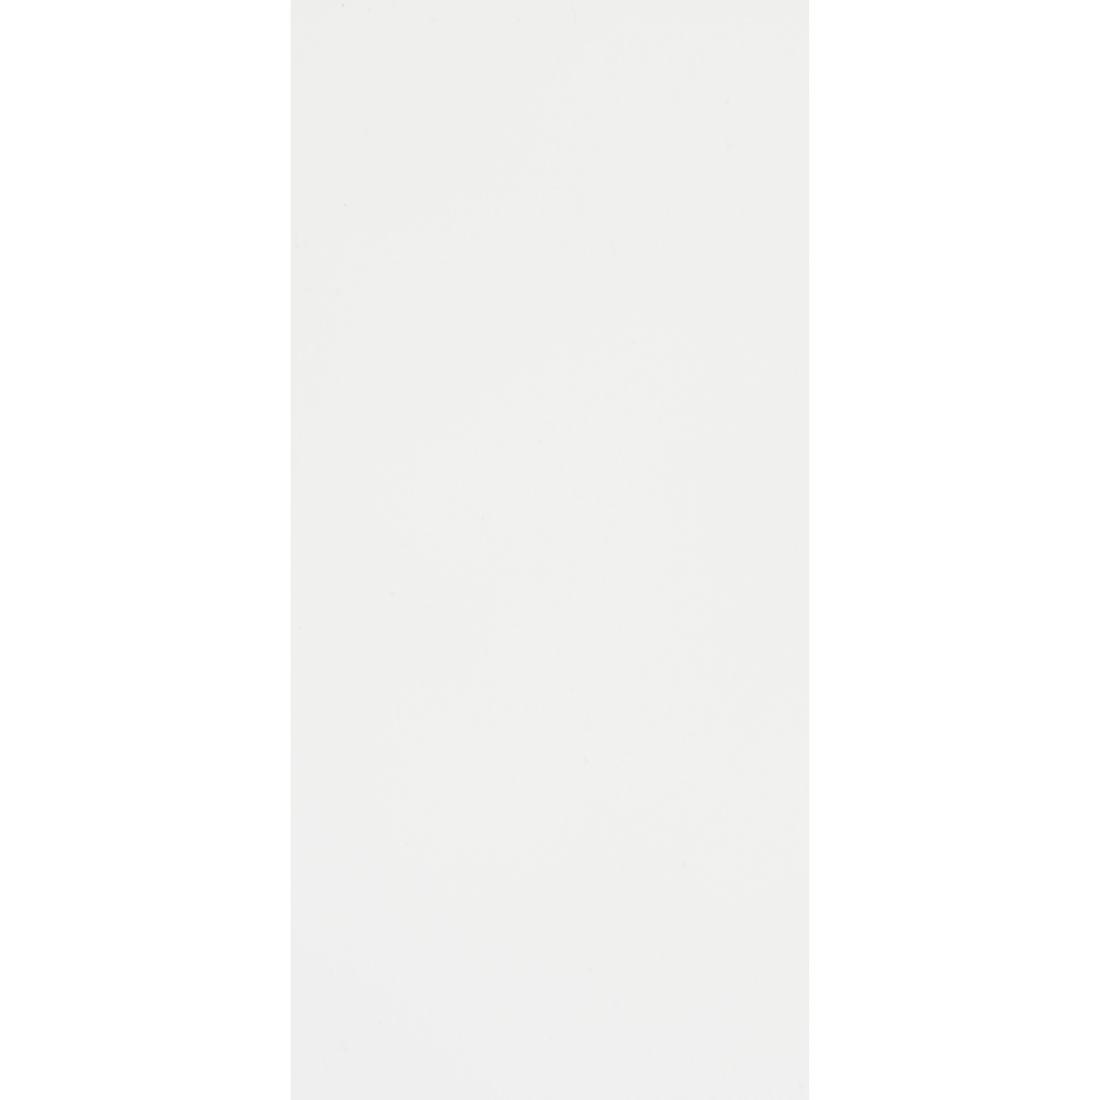 Aqua Wall Lining Panel Polar White Gloss 2400 x 1200 x 4.5mm